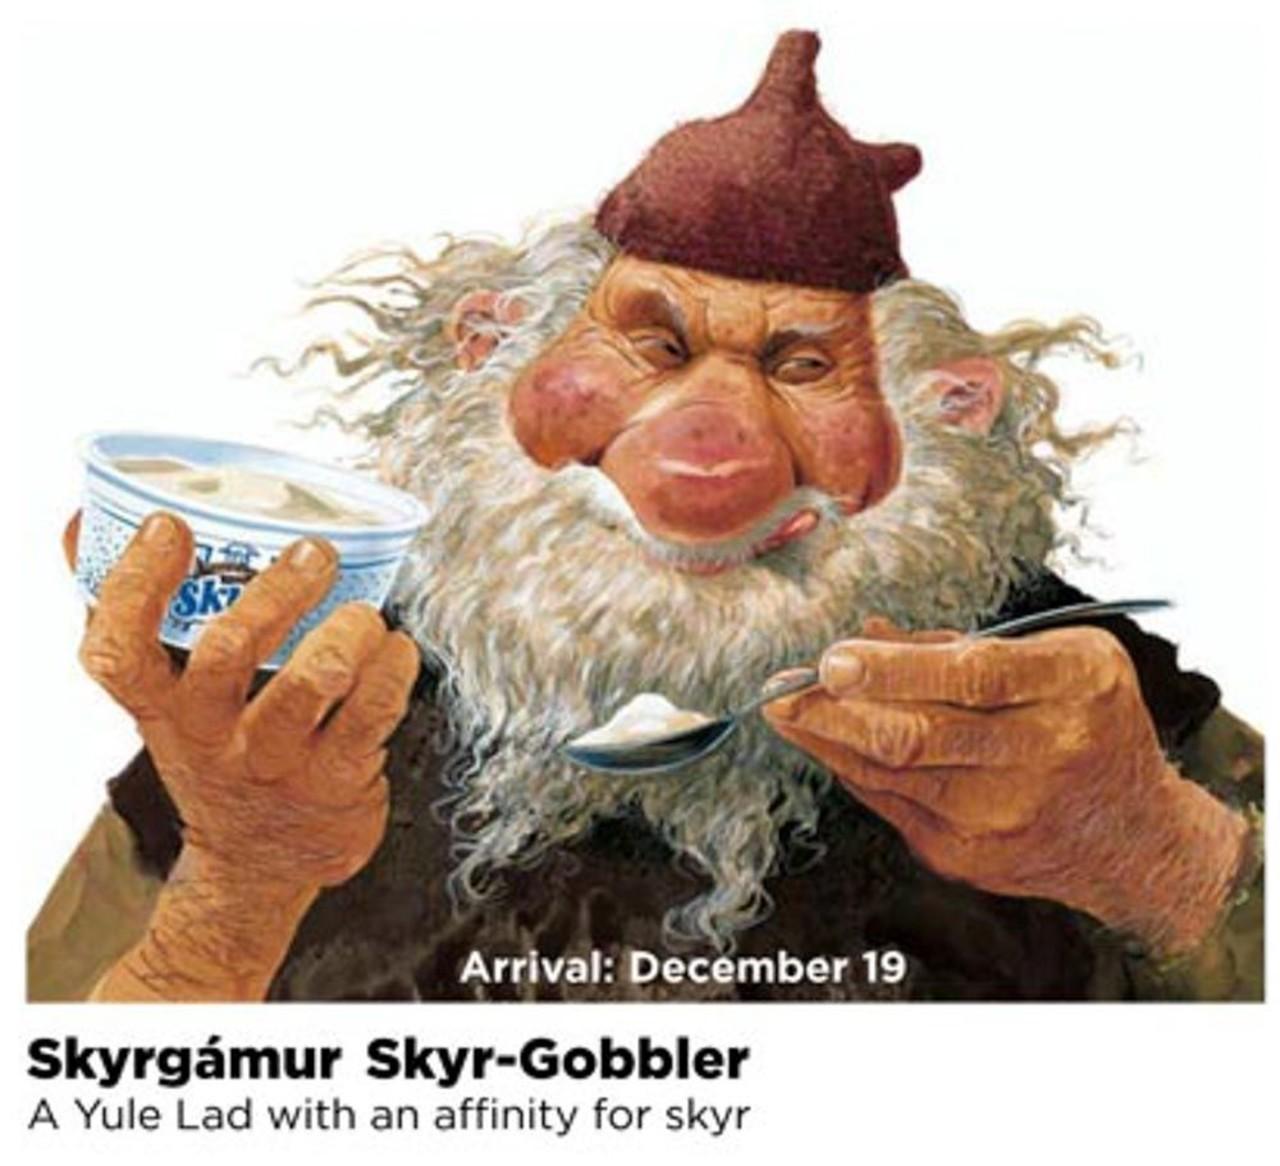 Happy Skyrgámur (Skyr-gobbler) he is on of the 13th Icelandic Yule lads eating a skyr